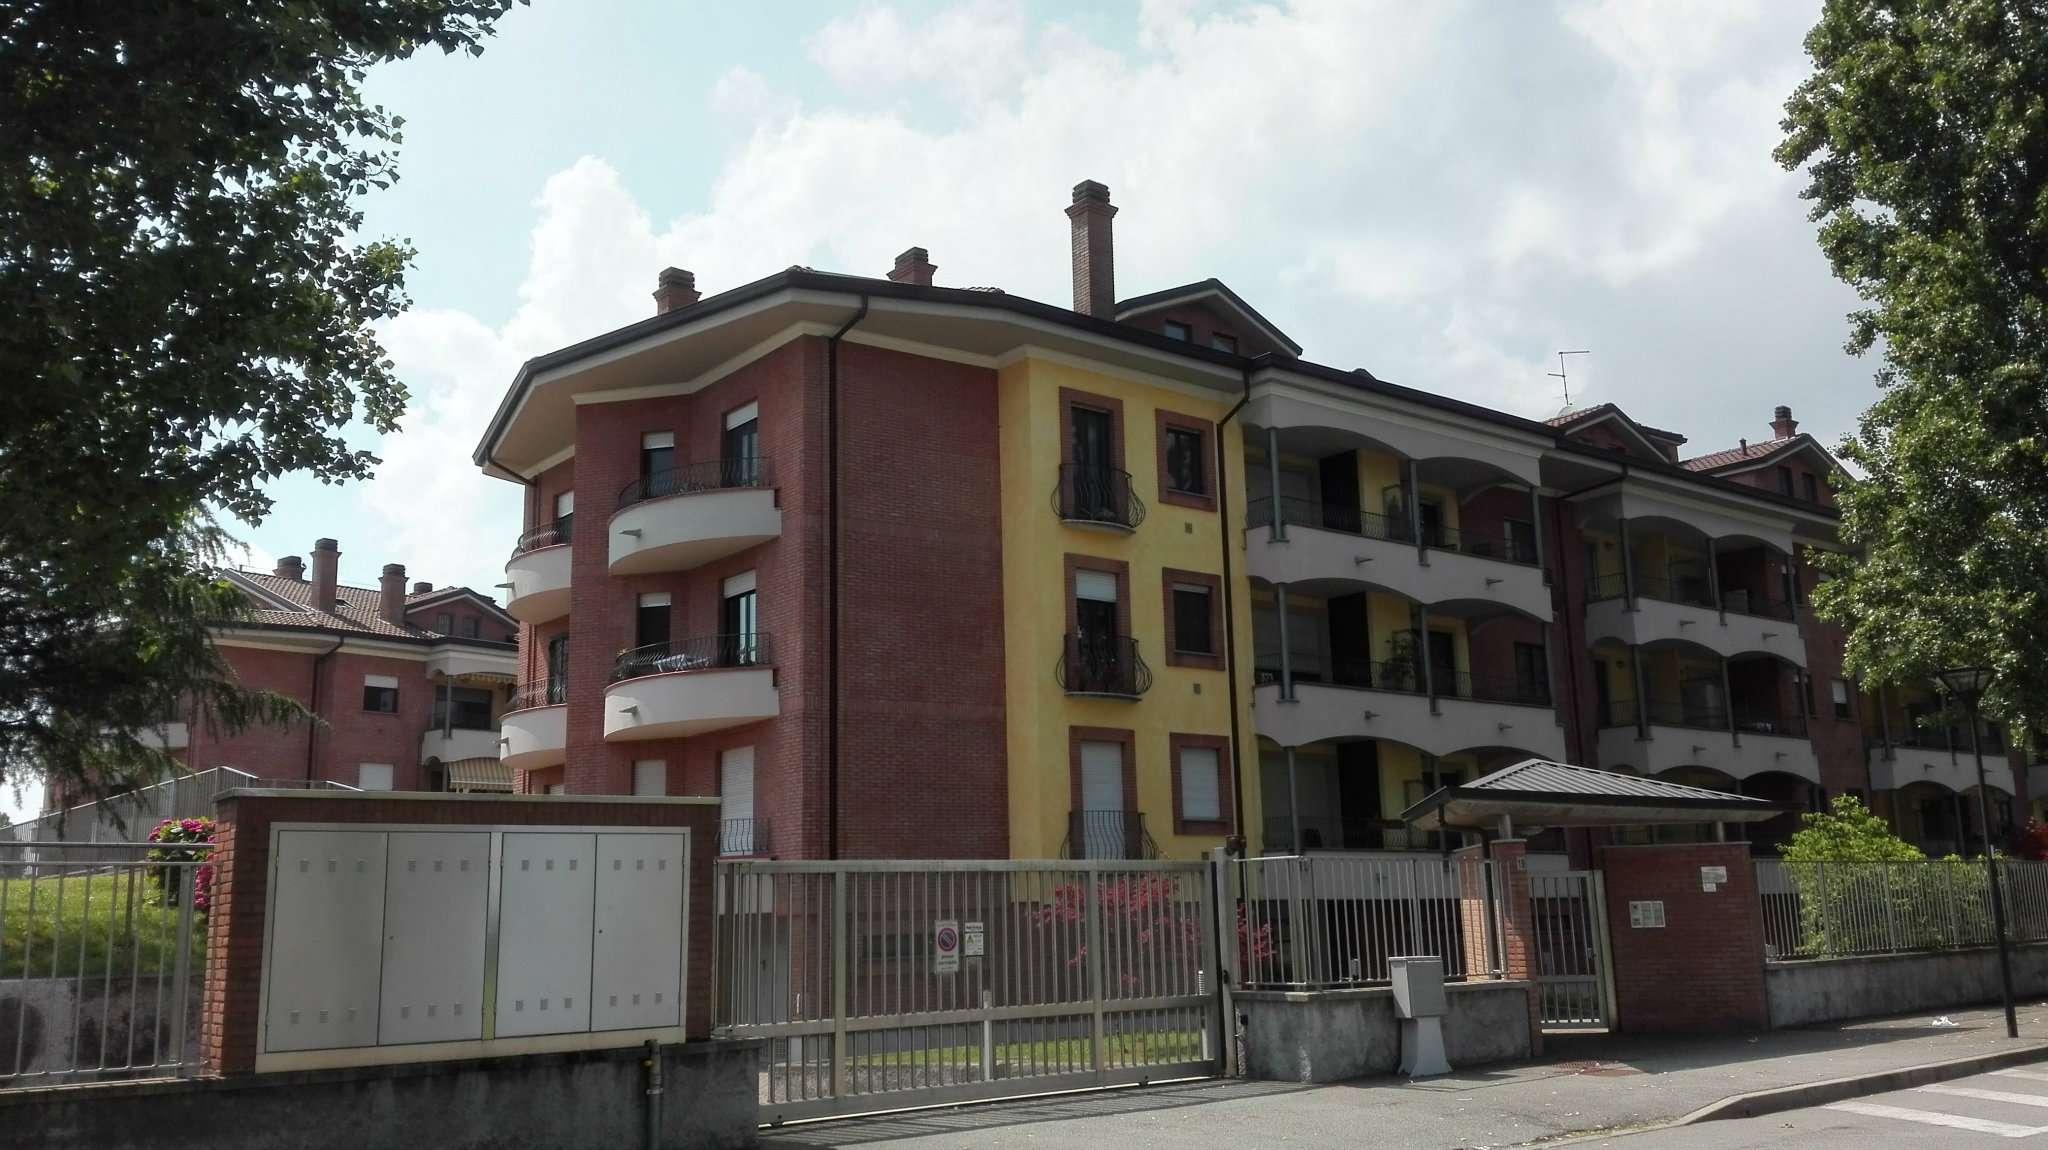 peschiera borromeo affittasi 2 locali arredato elegante palazzina